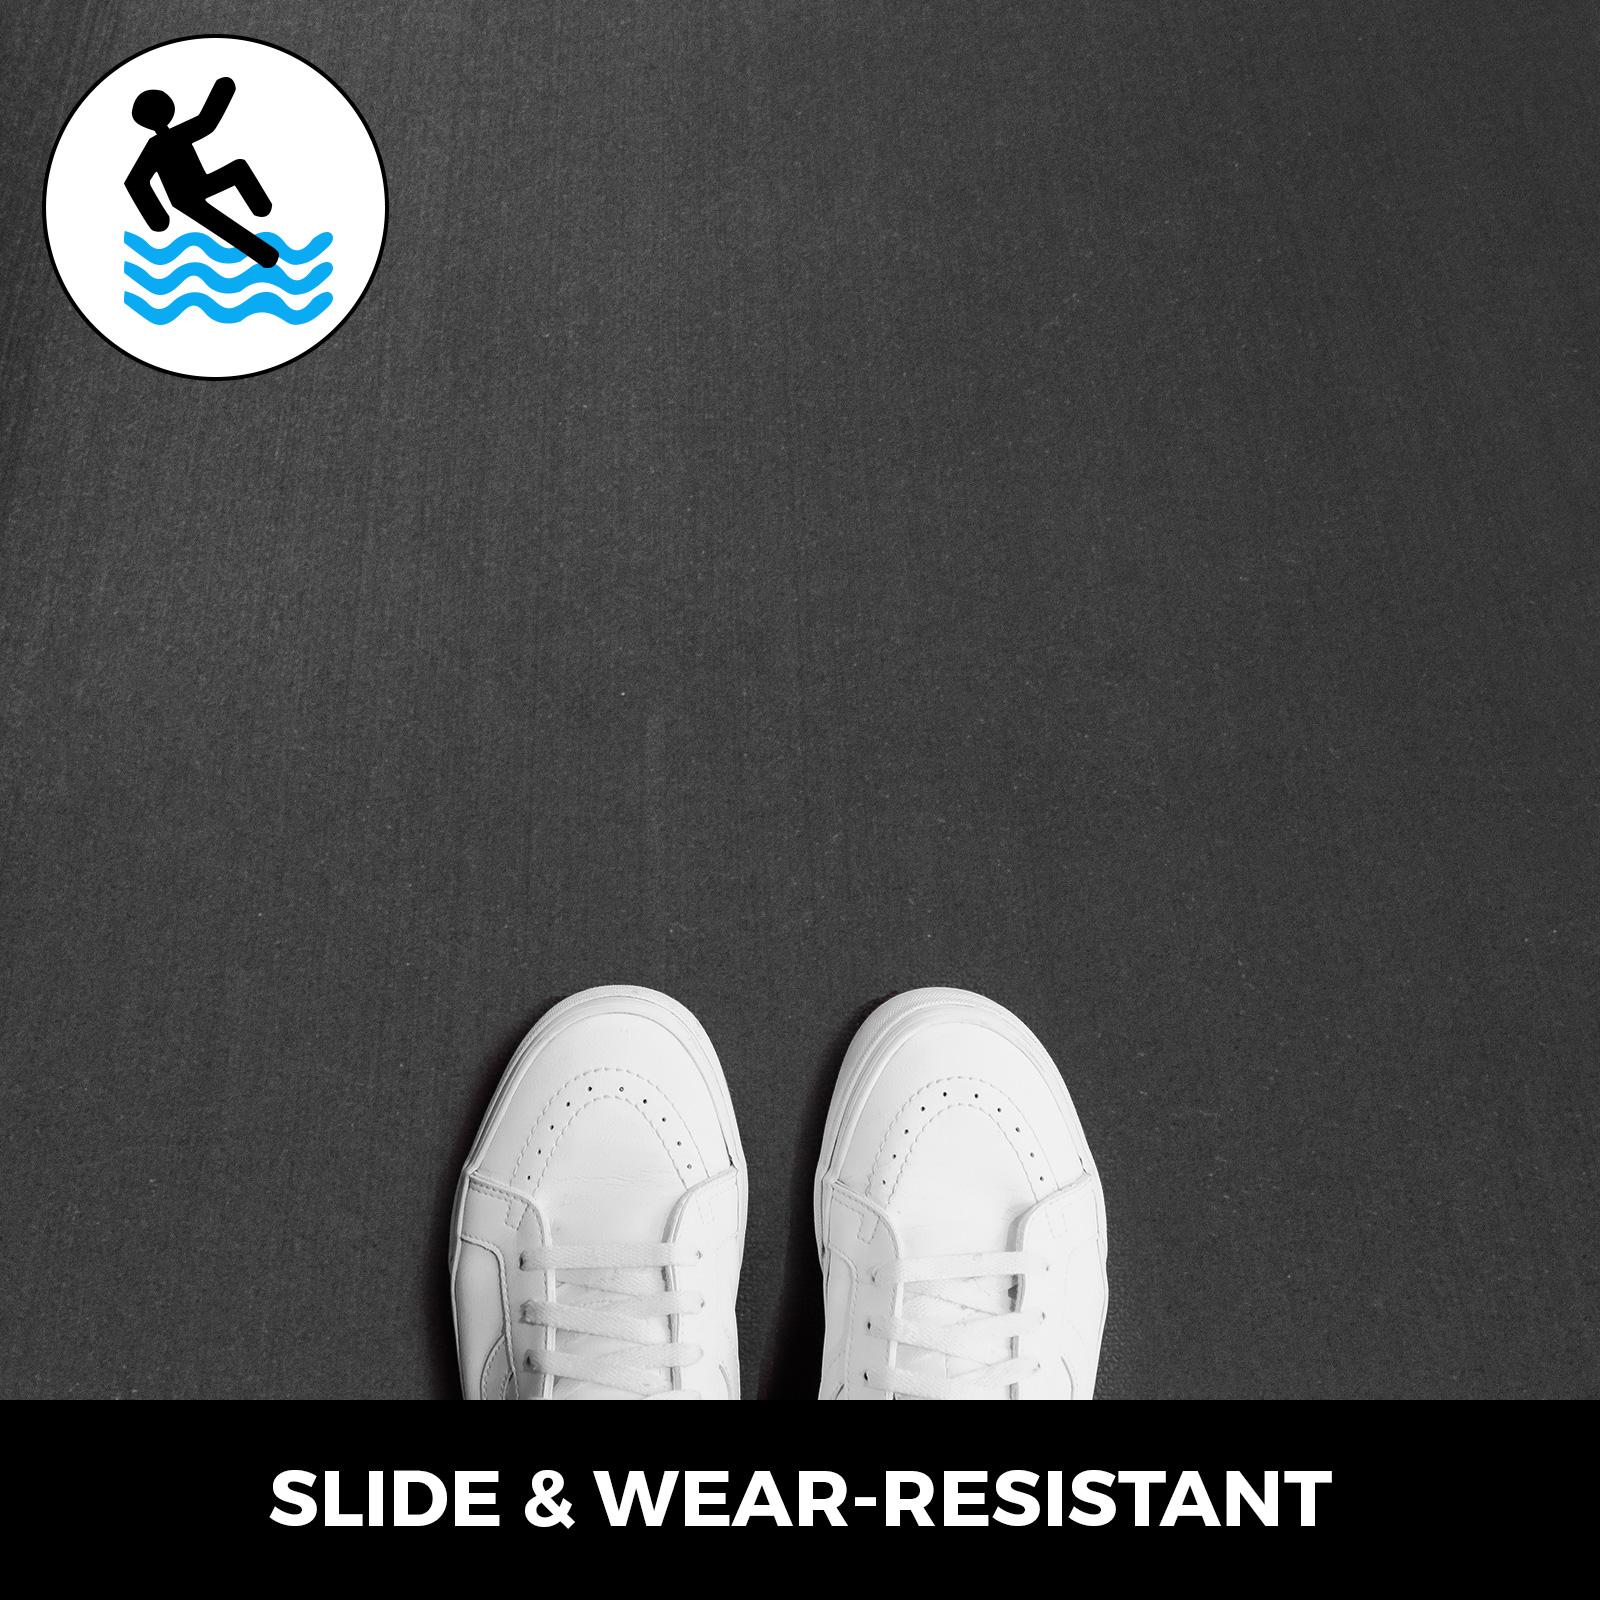 Rubber Floor Mats Flooring Rolls Exercise /& Gym Heavy Duty Fitness Equipment Mat